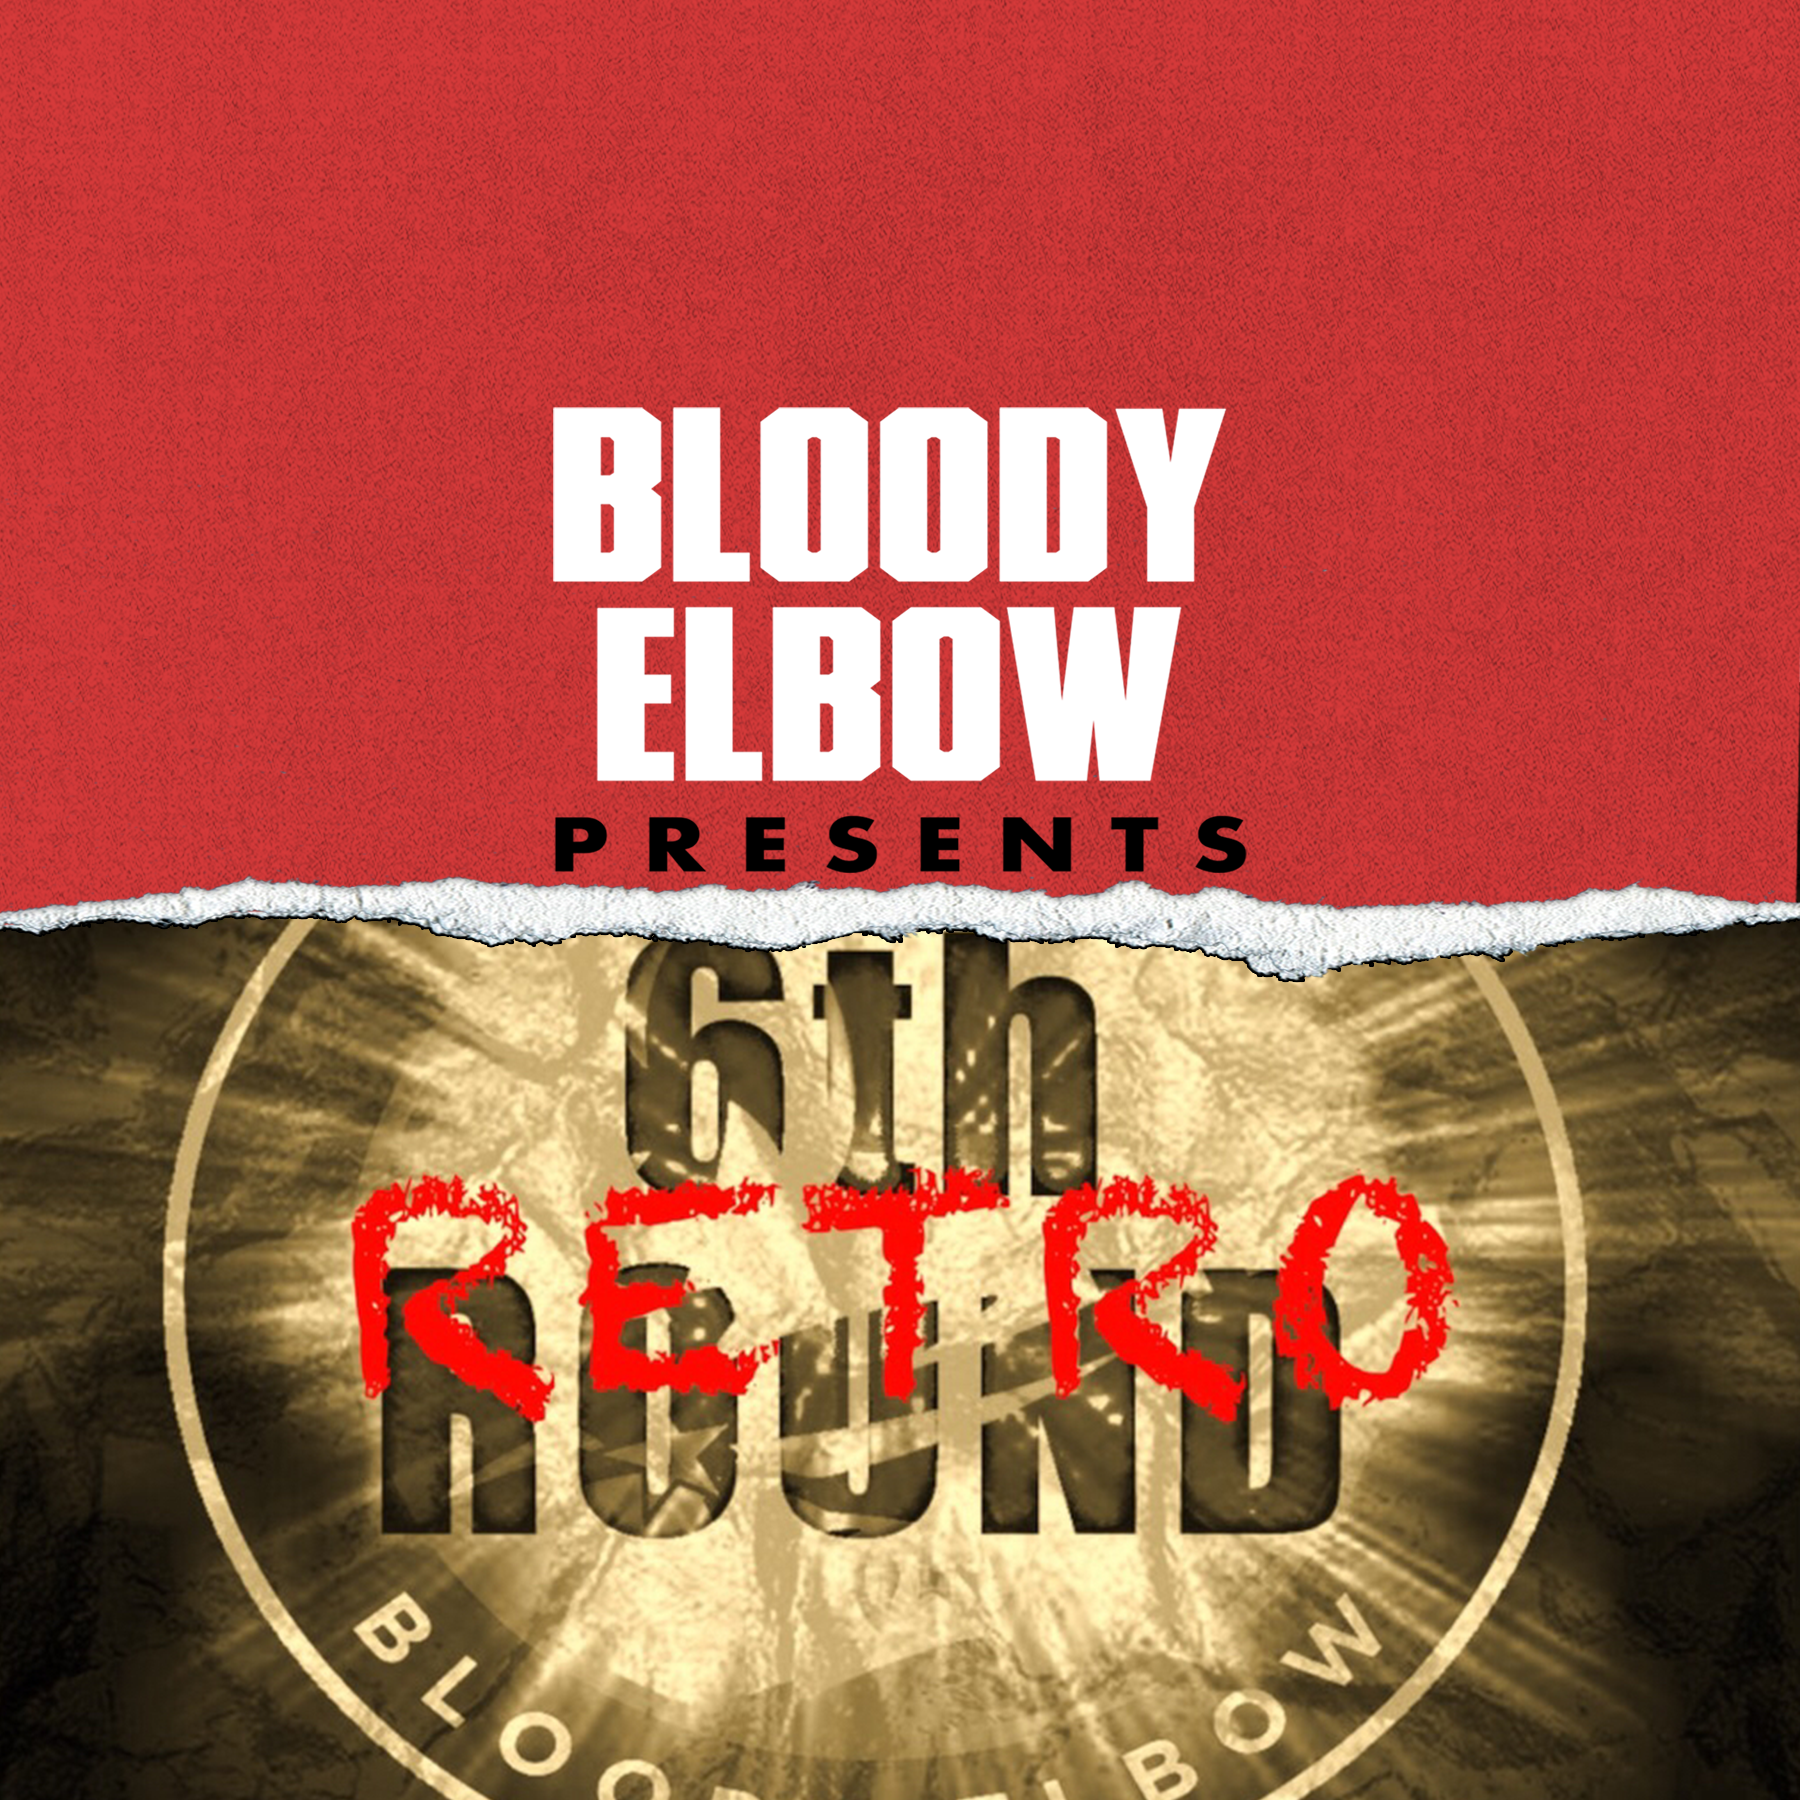 6TH ROUND RETRO, 6th Round, Post-Fight Show, UFC podcast, MMA Podcast, Bellator Podcast, Historic Fights